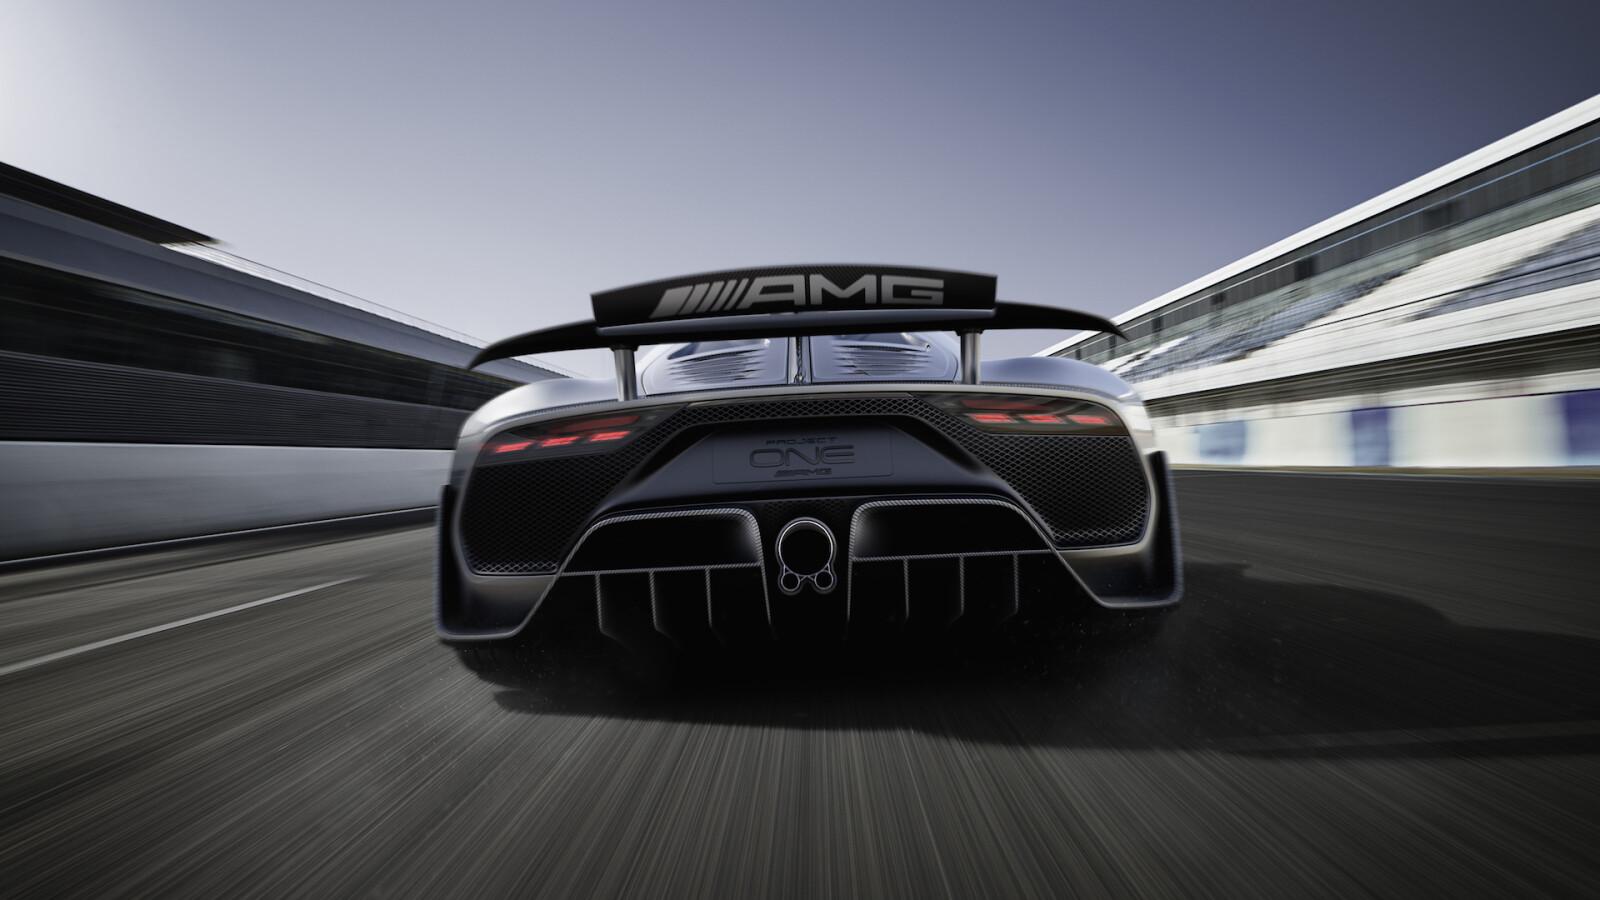 Mercedes AMG Project One Hat Jemand Da Gerade Grossenwahn Gesagt